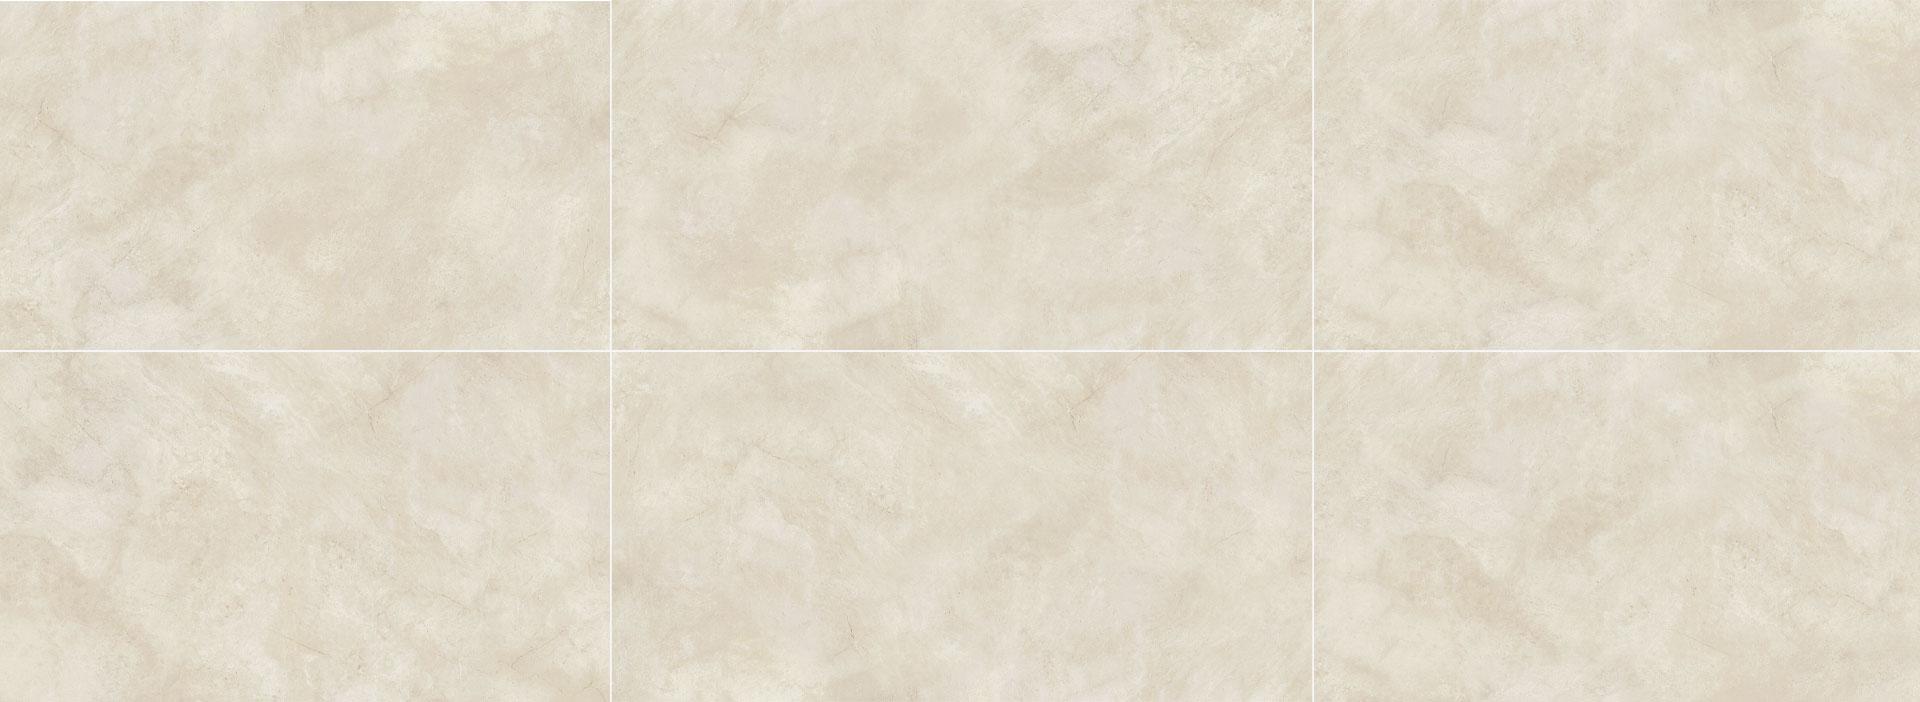 Stone Marfil